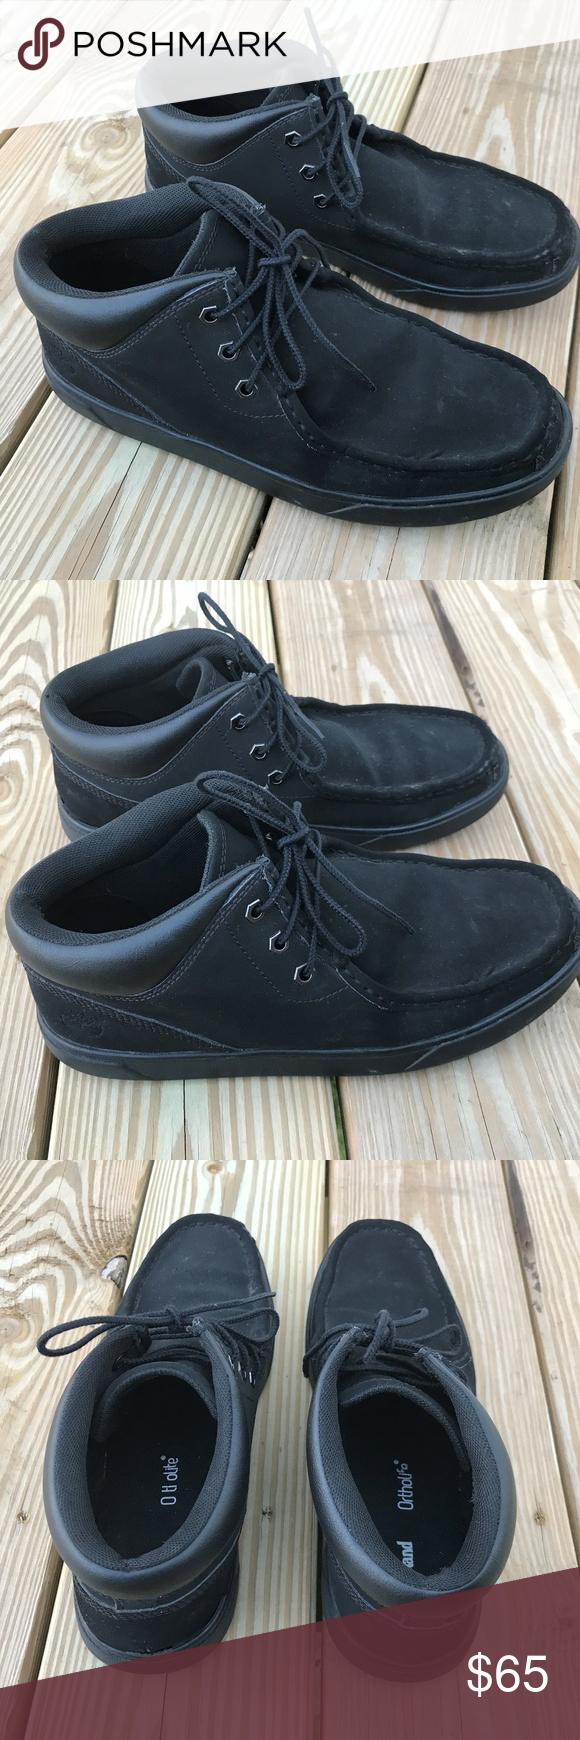 Black Ortholite Boots Sz 8